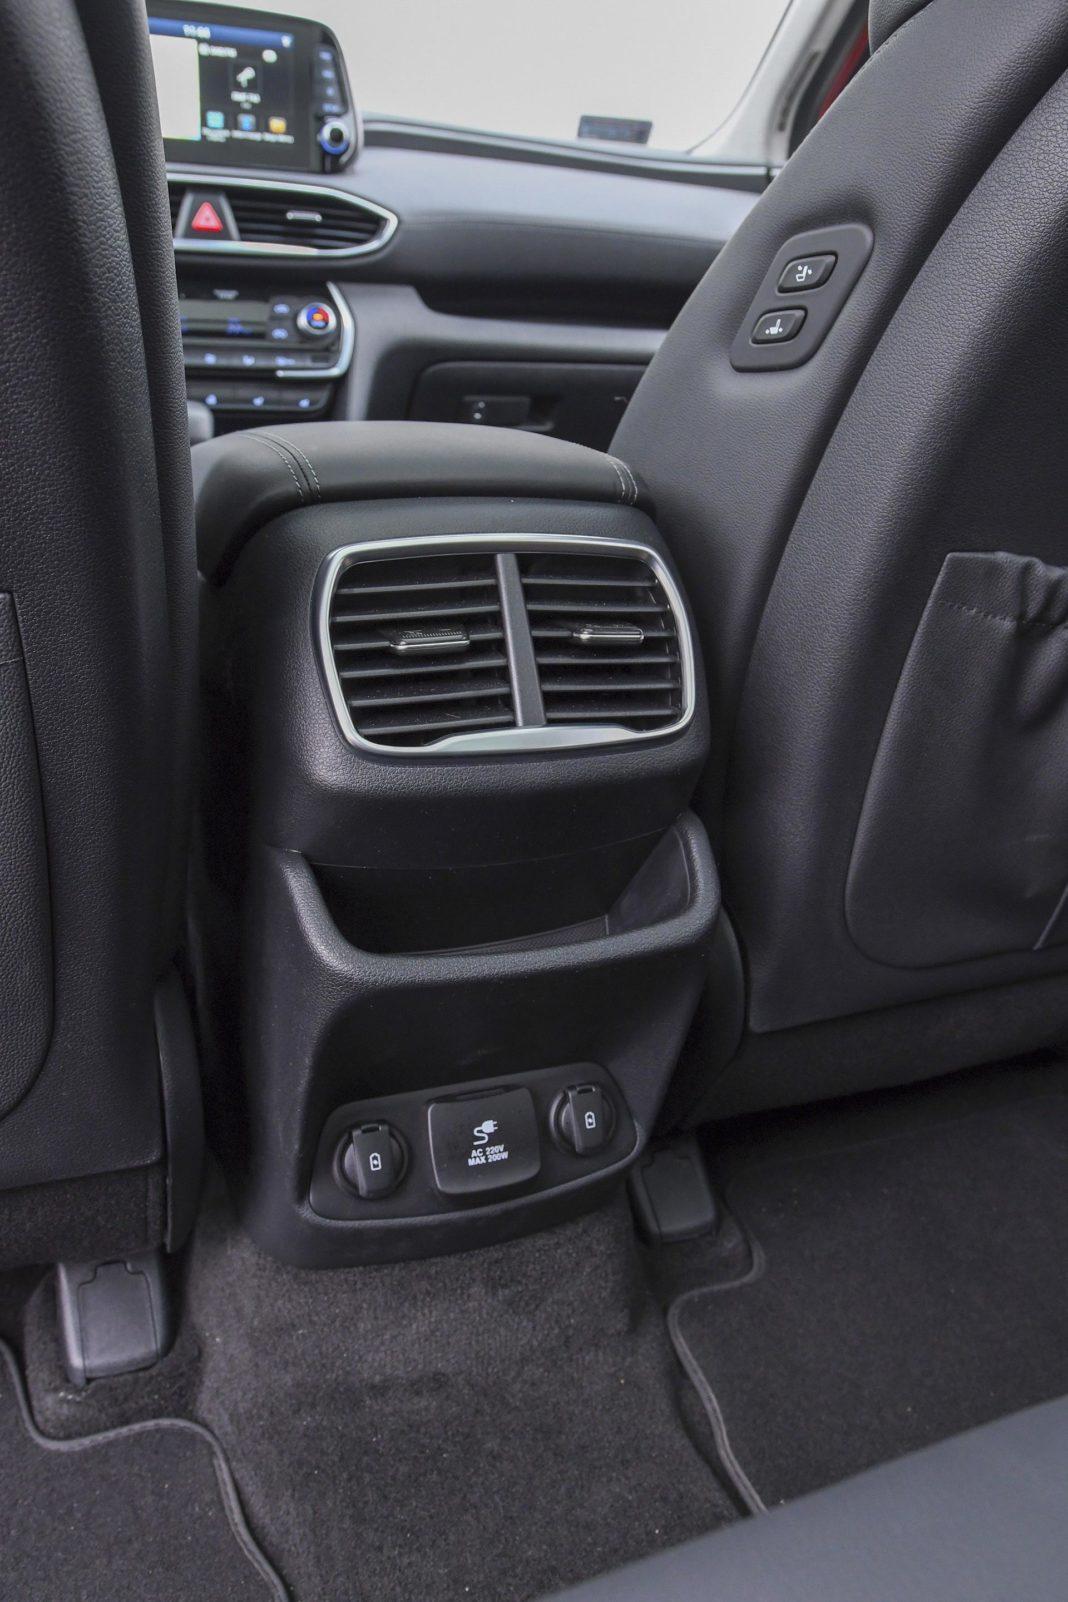 Hyundai Santa Fe 2.0 CRDi 8AT 4WD - nawiewy na tył